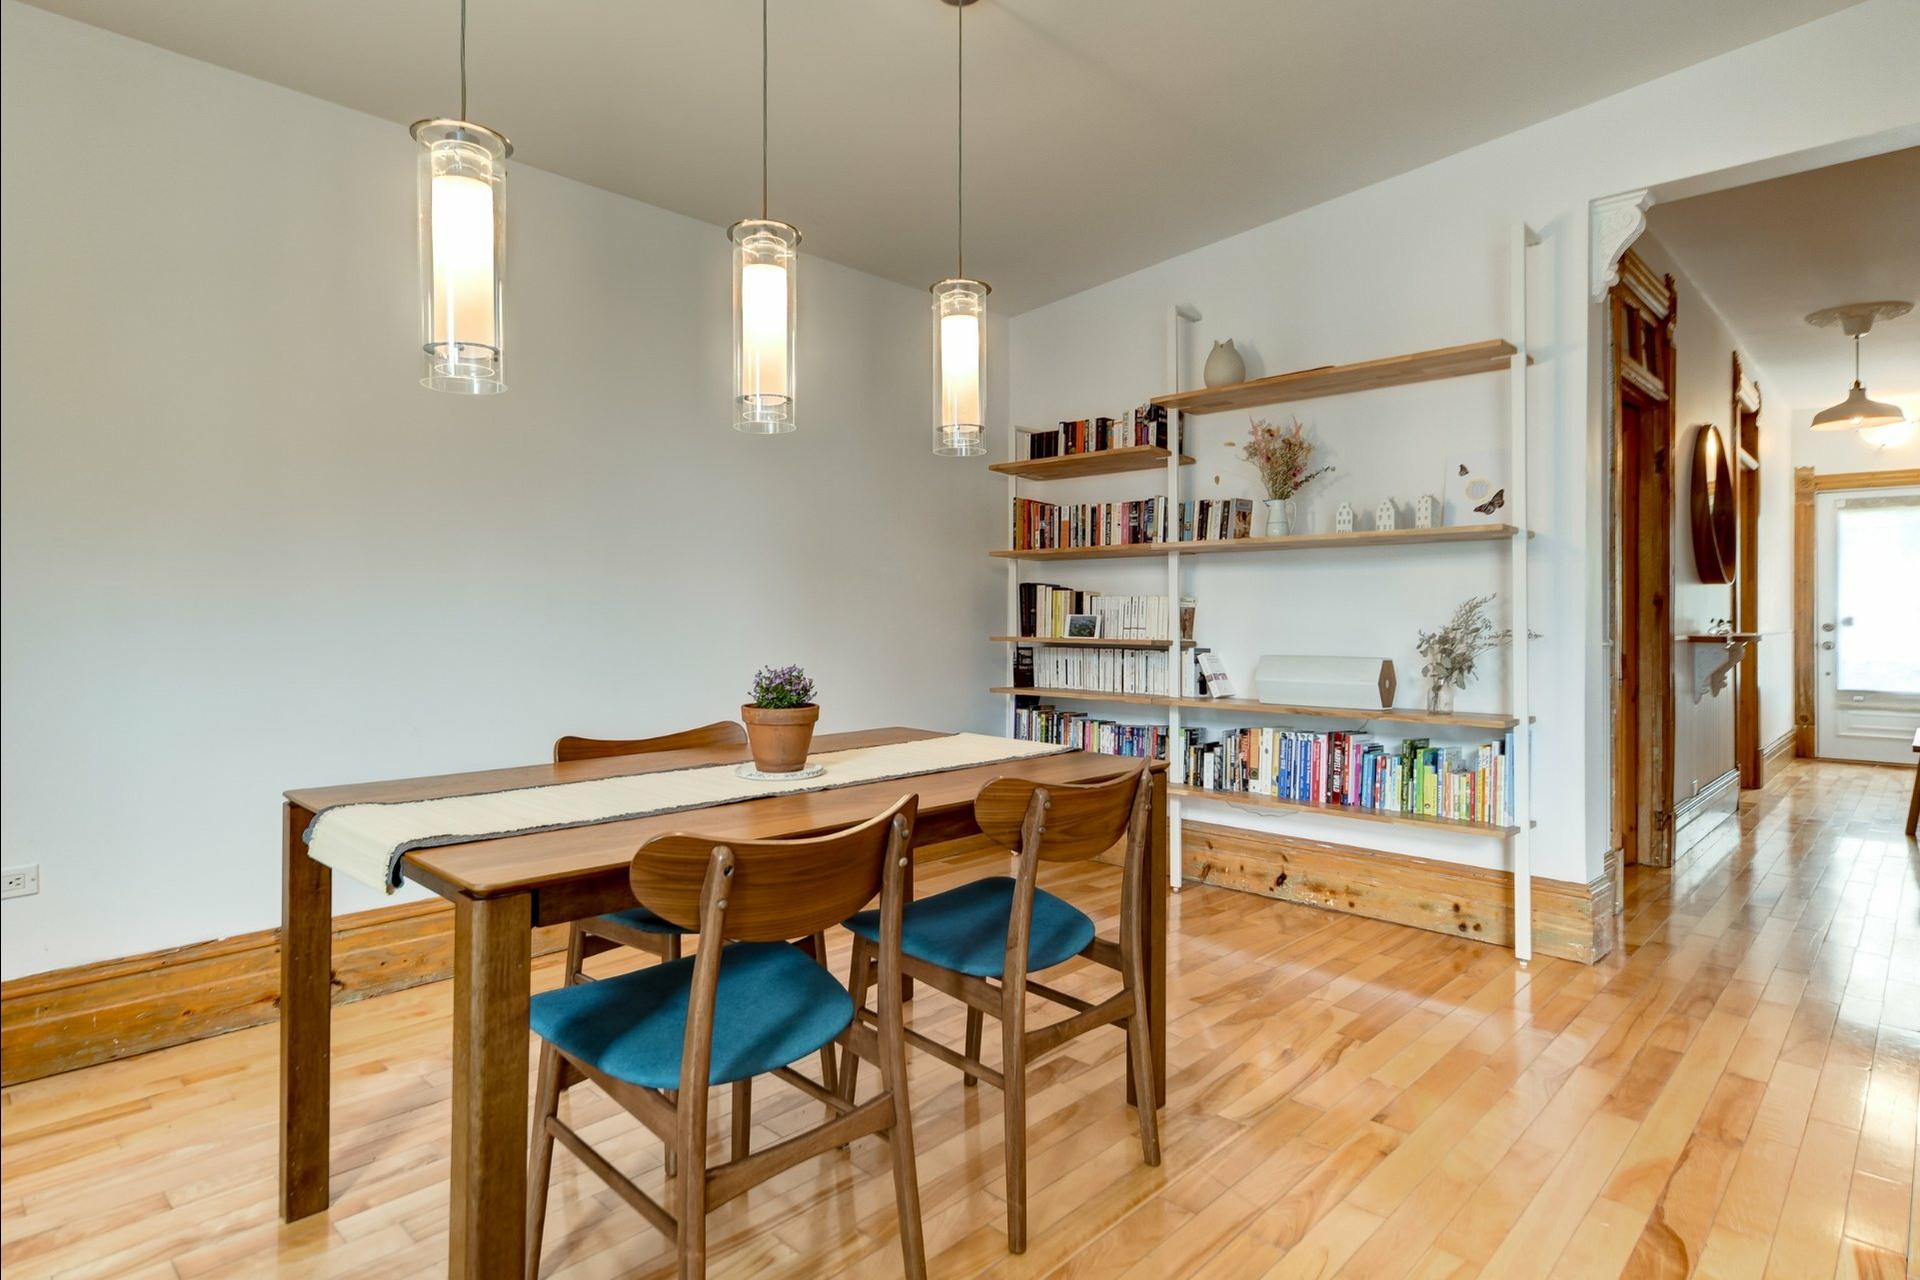 image 11 - Departamento En venta Le Plateau-Mont-Royal Montréal  - 6 habitaciones